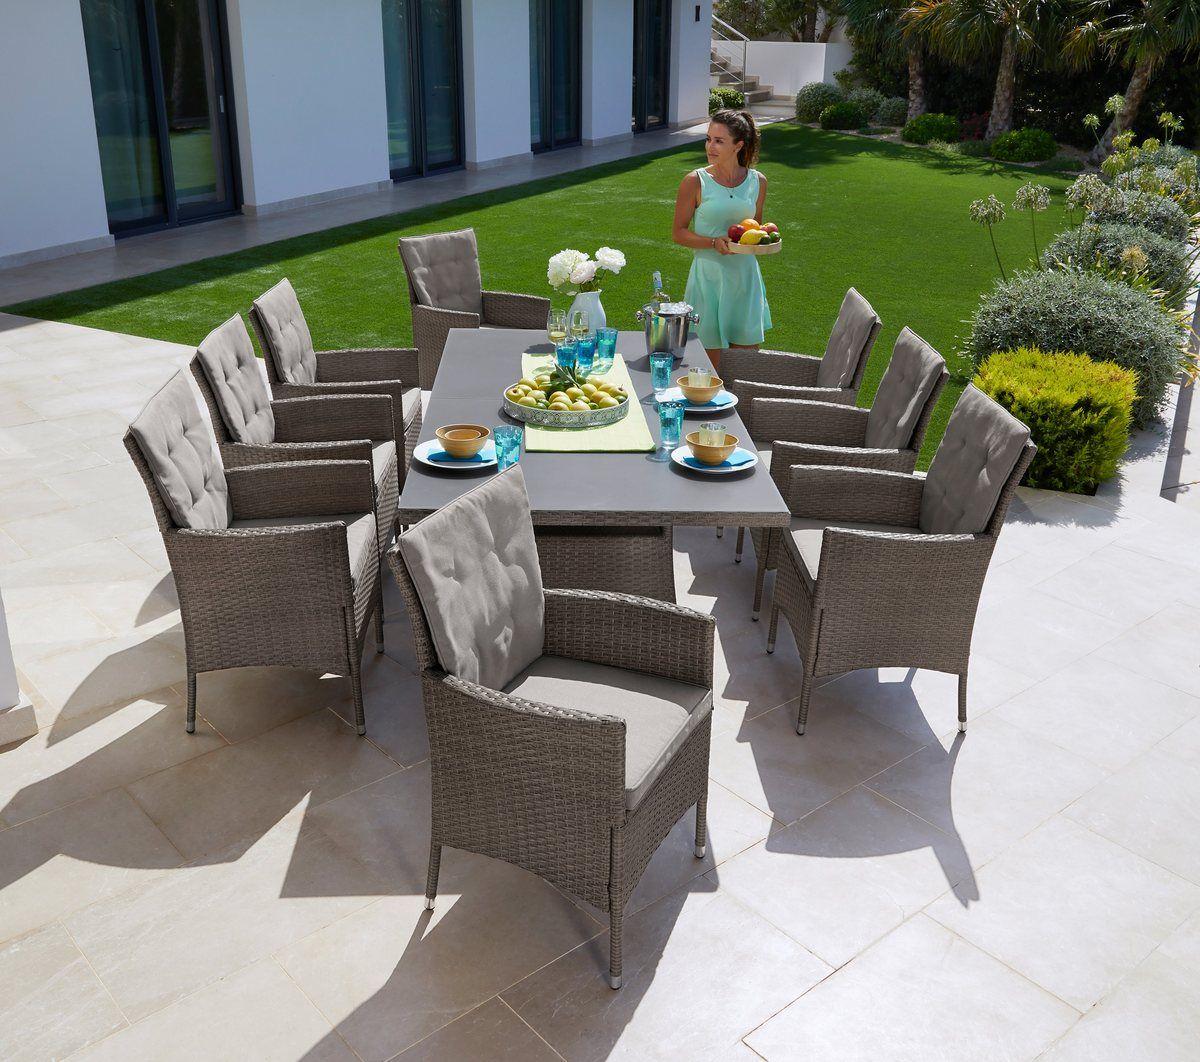 Gartenmobelset Mailand 25 Tlg 8 Sessel Tisch 200x100 Cm